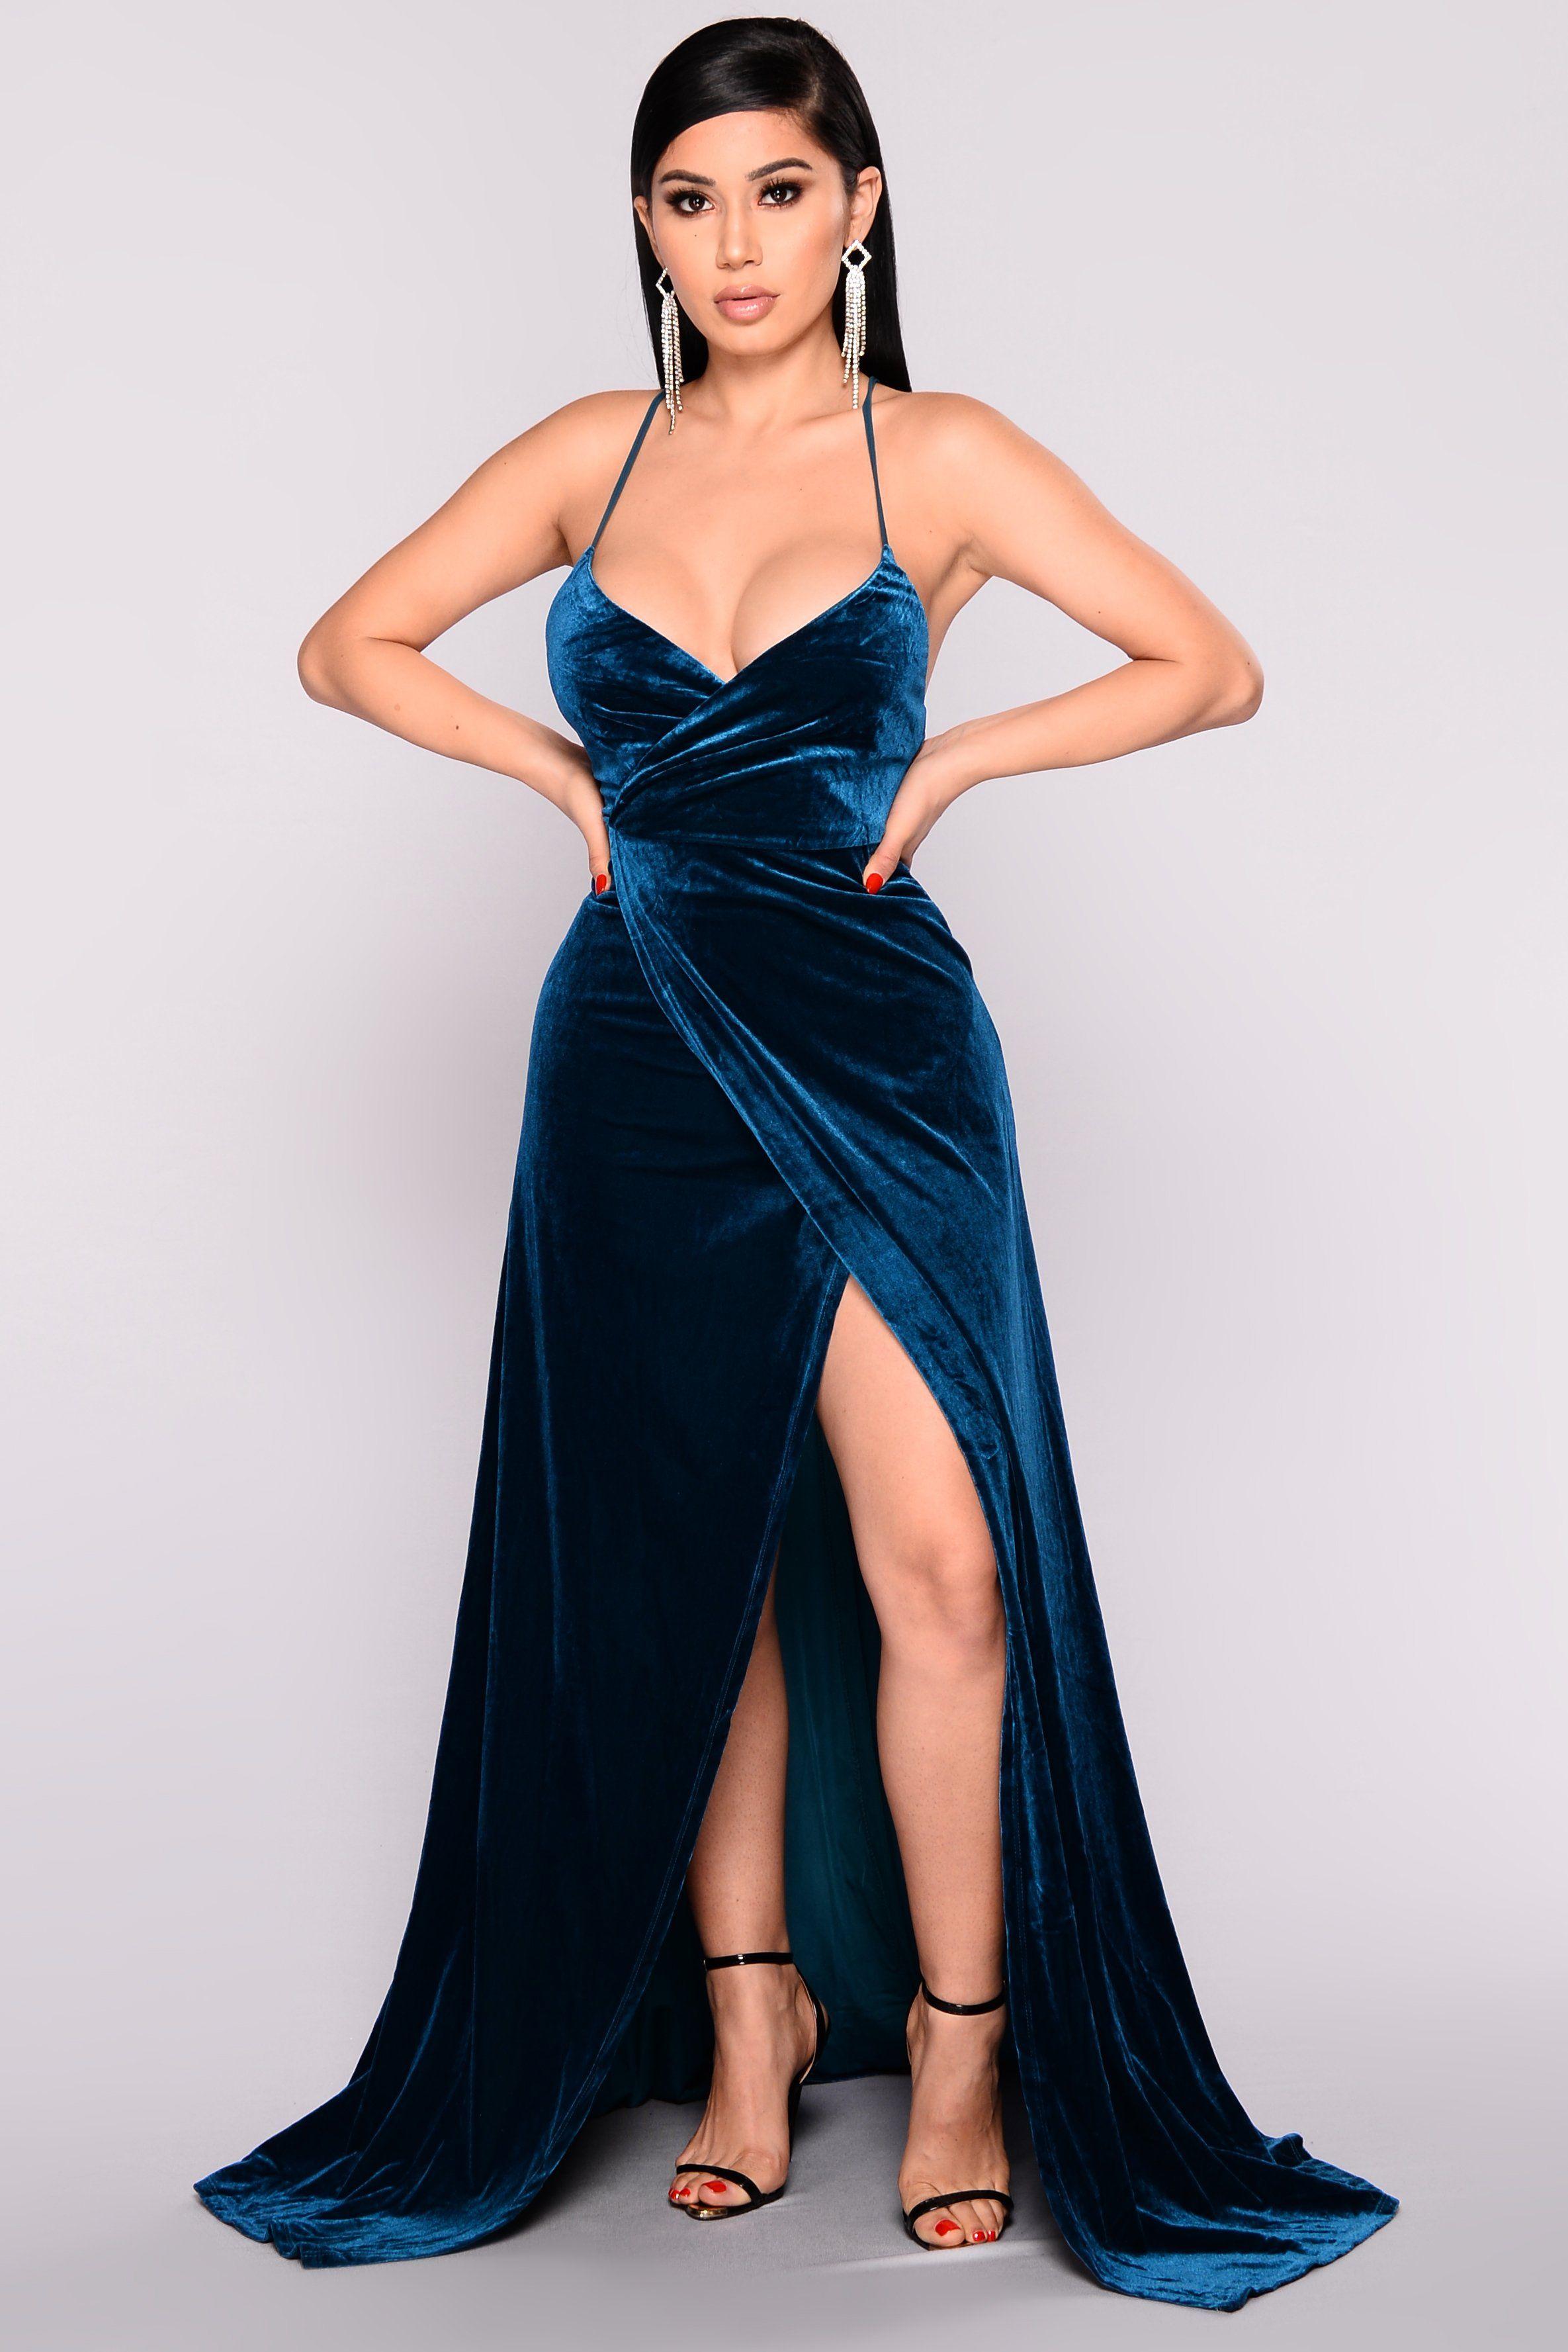 Wishful Thinking Dress Teal Wish List Dresses Hoco Dresses High Slit Dress